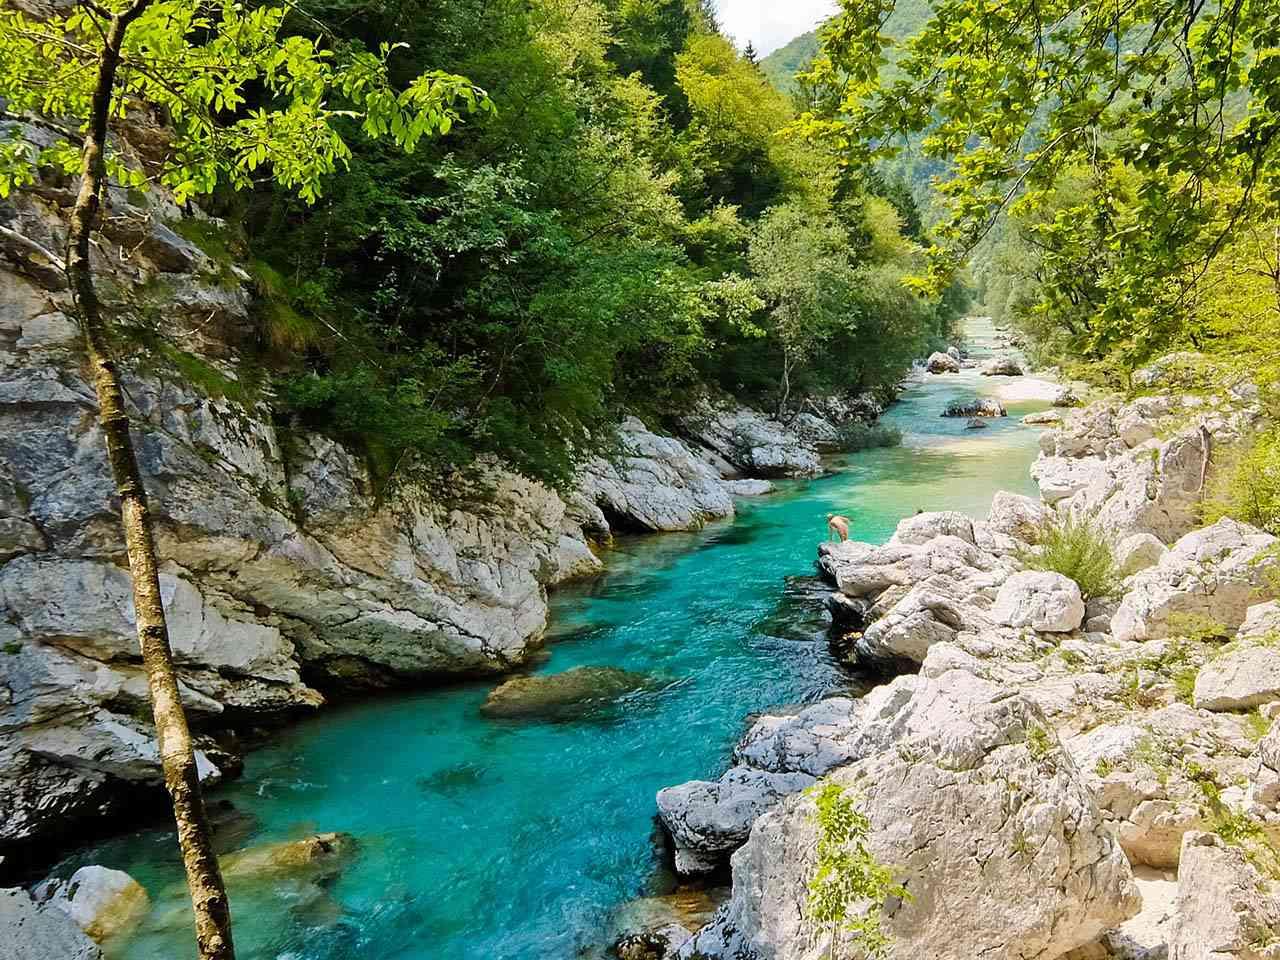 River Soča, Slovenia